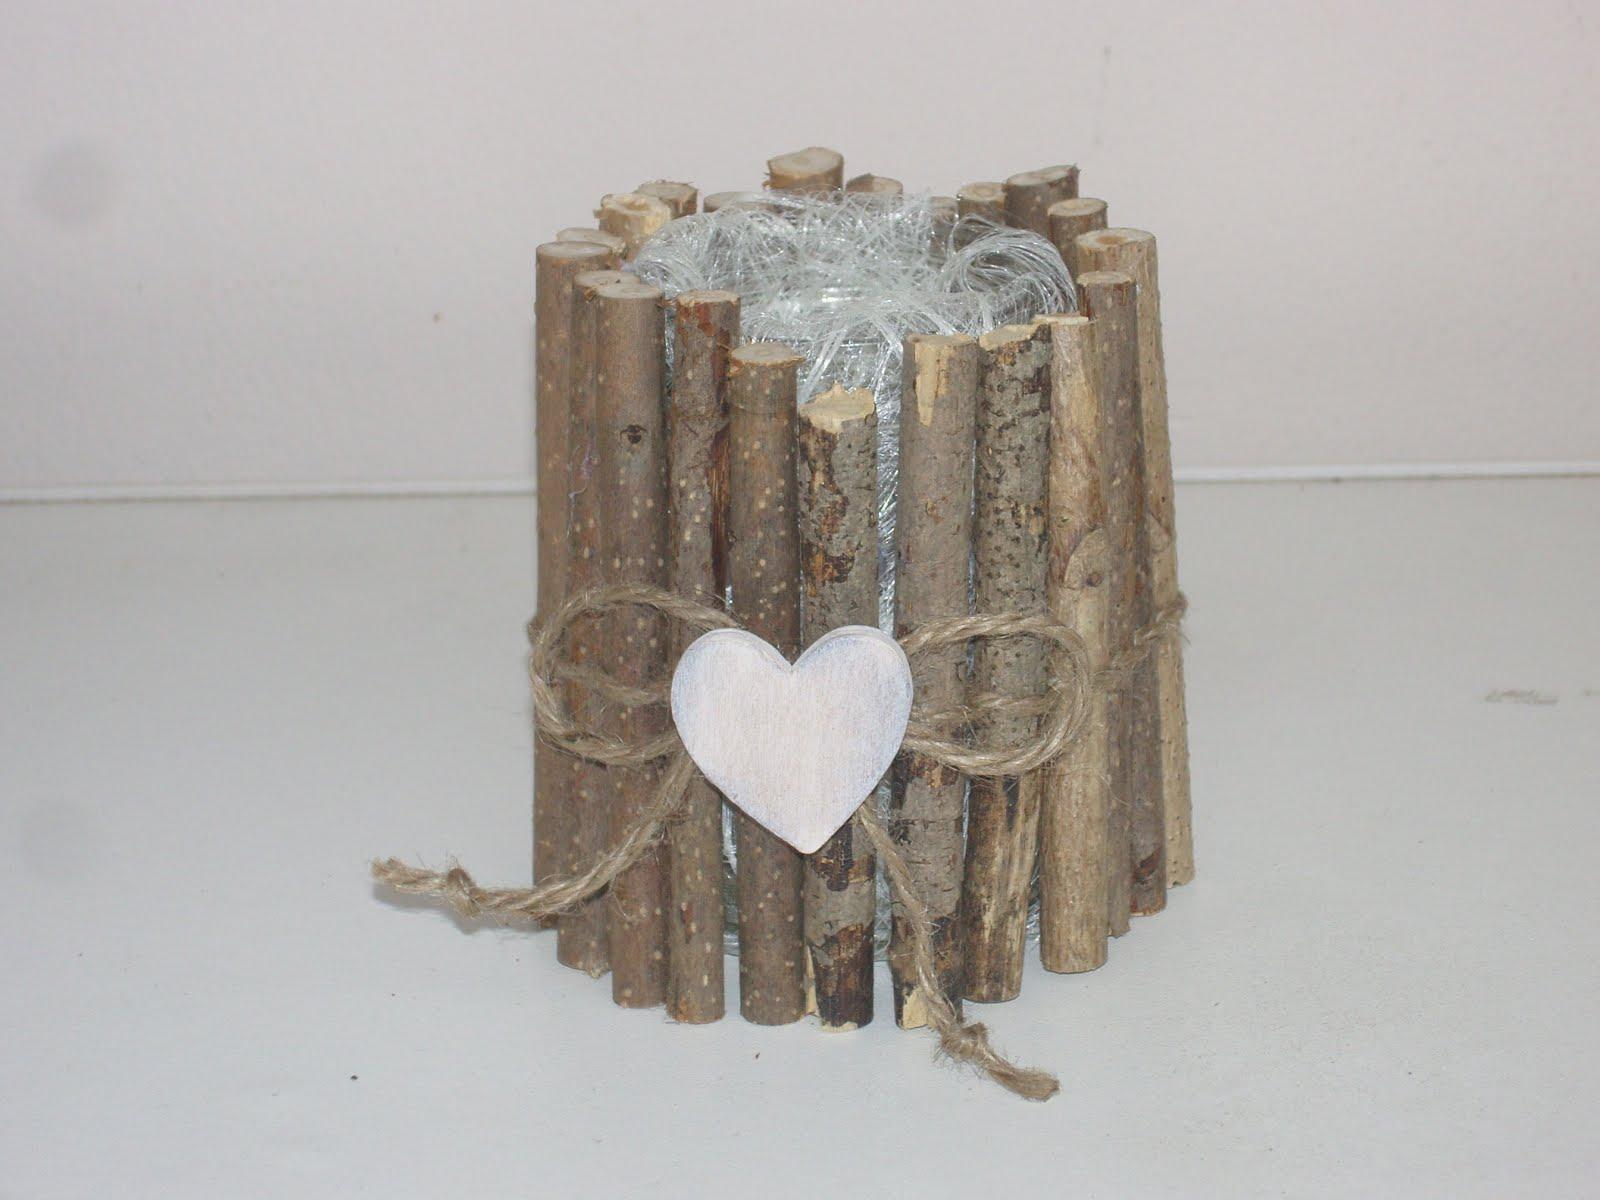 Un cache pot avec bois et brindilles 20 id es originales pour trouver l 39 inspi - Piscina fai da te legno ...